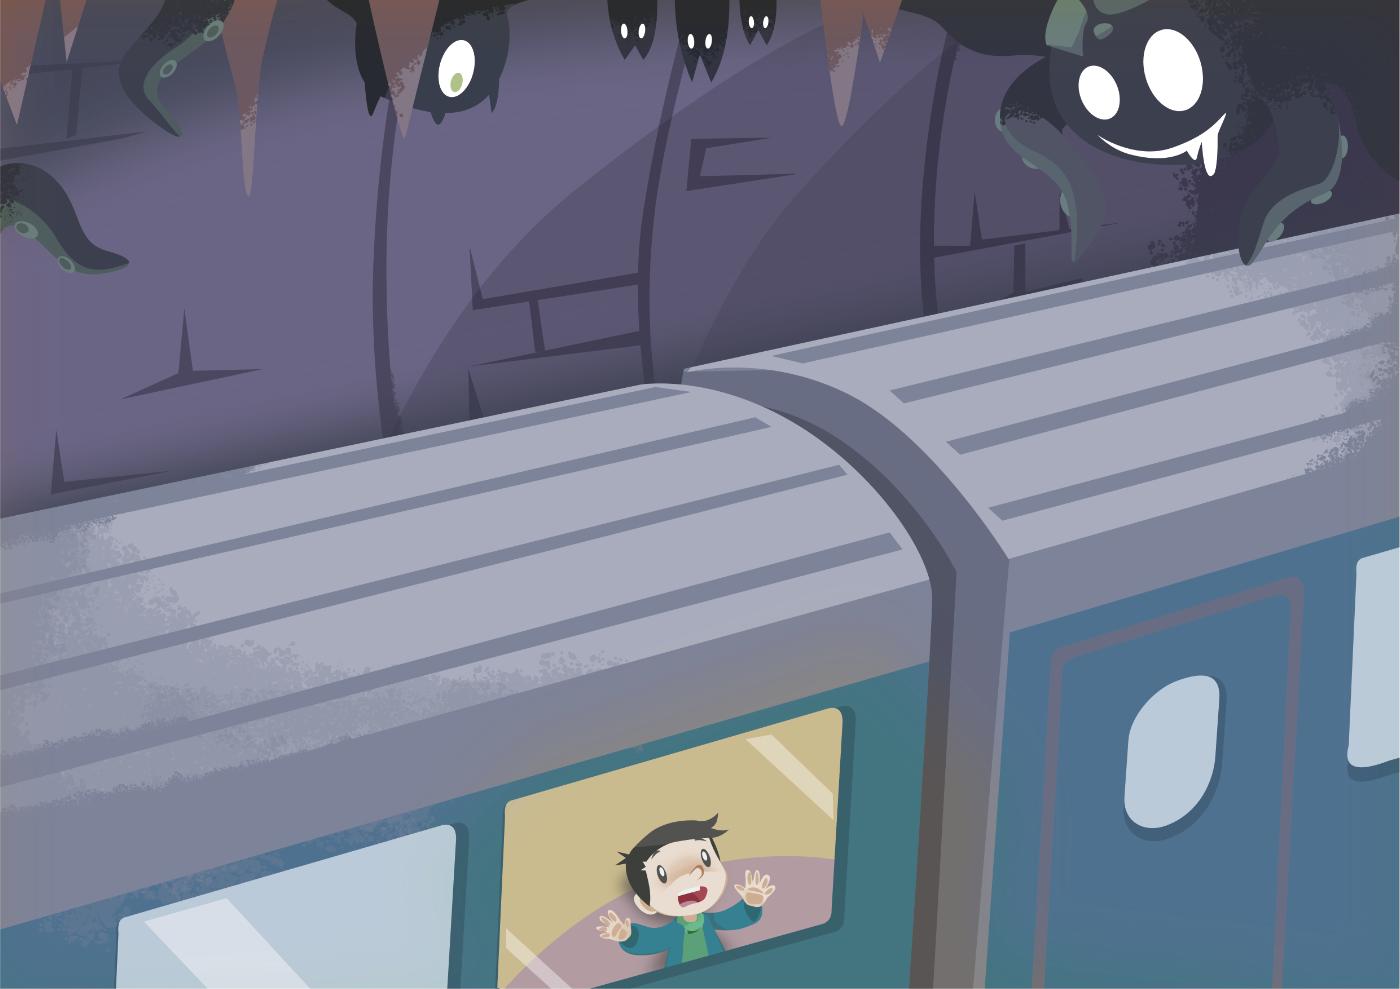 Contest Entry book illustration children illustration rossio lisboa monsters trains